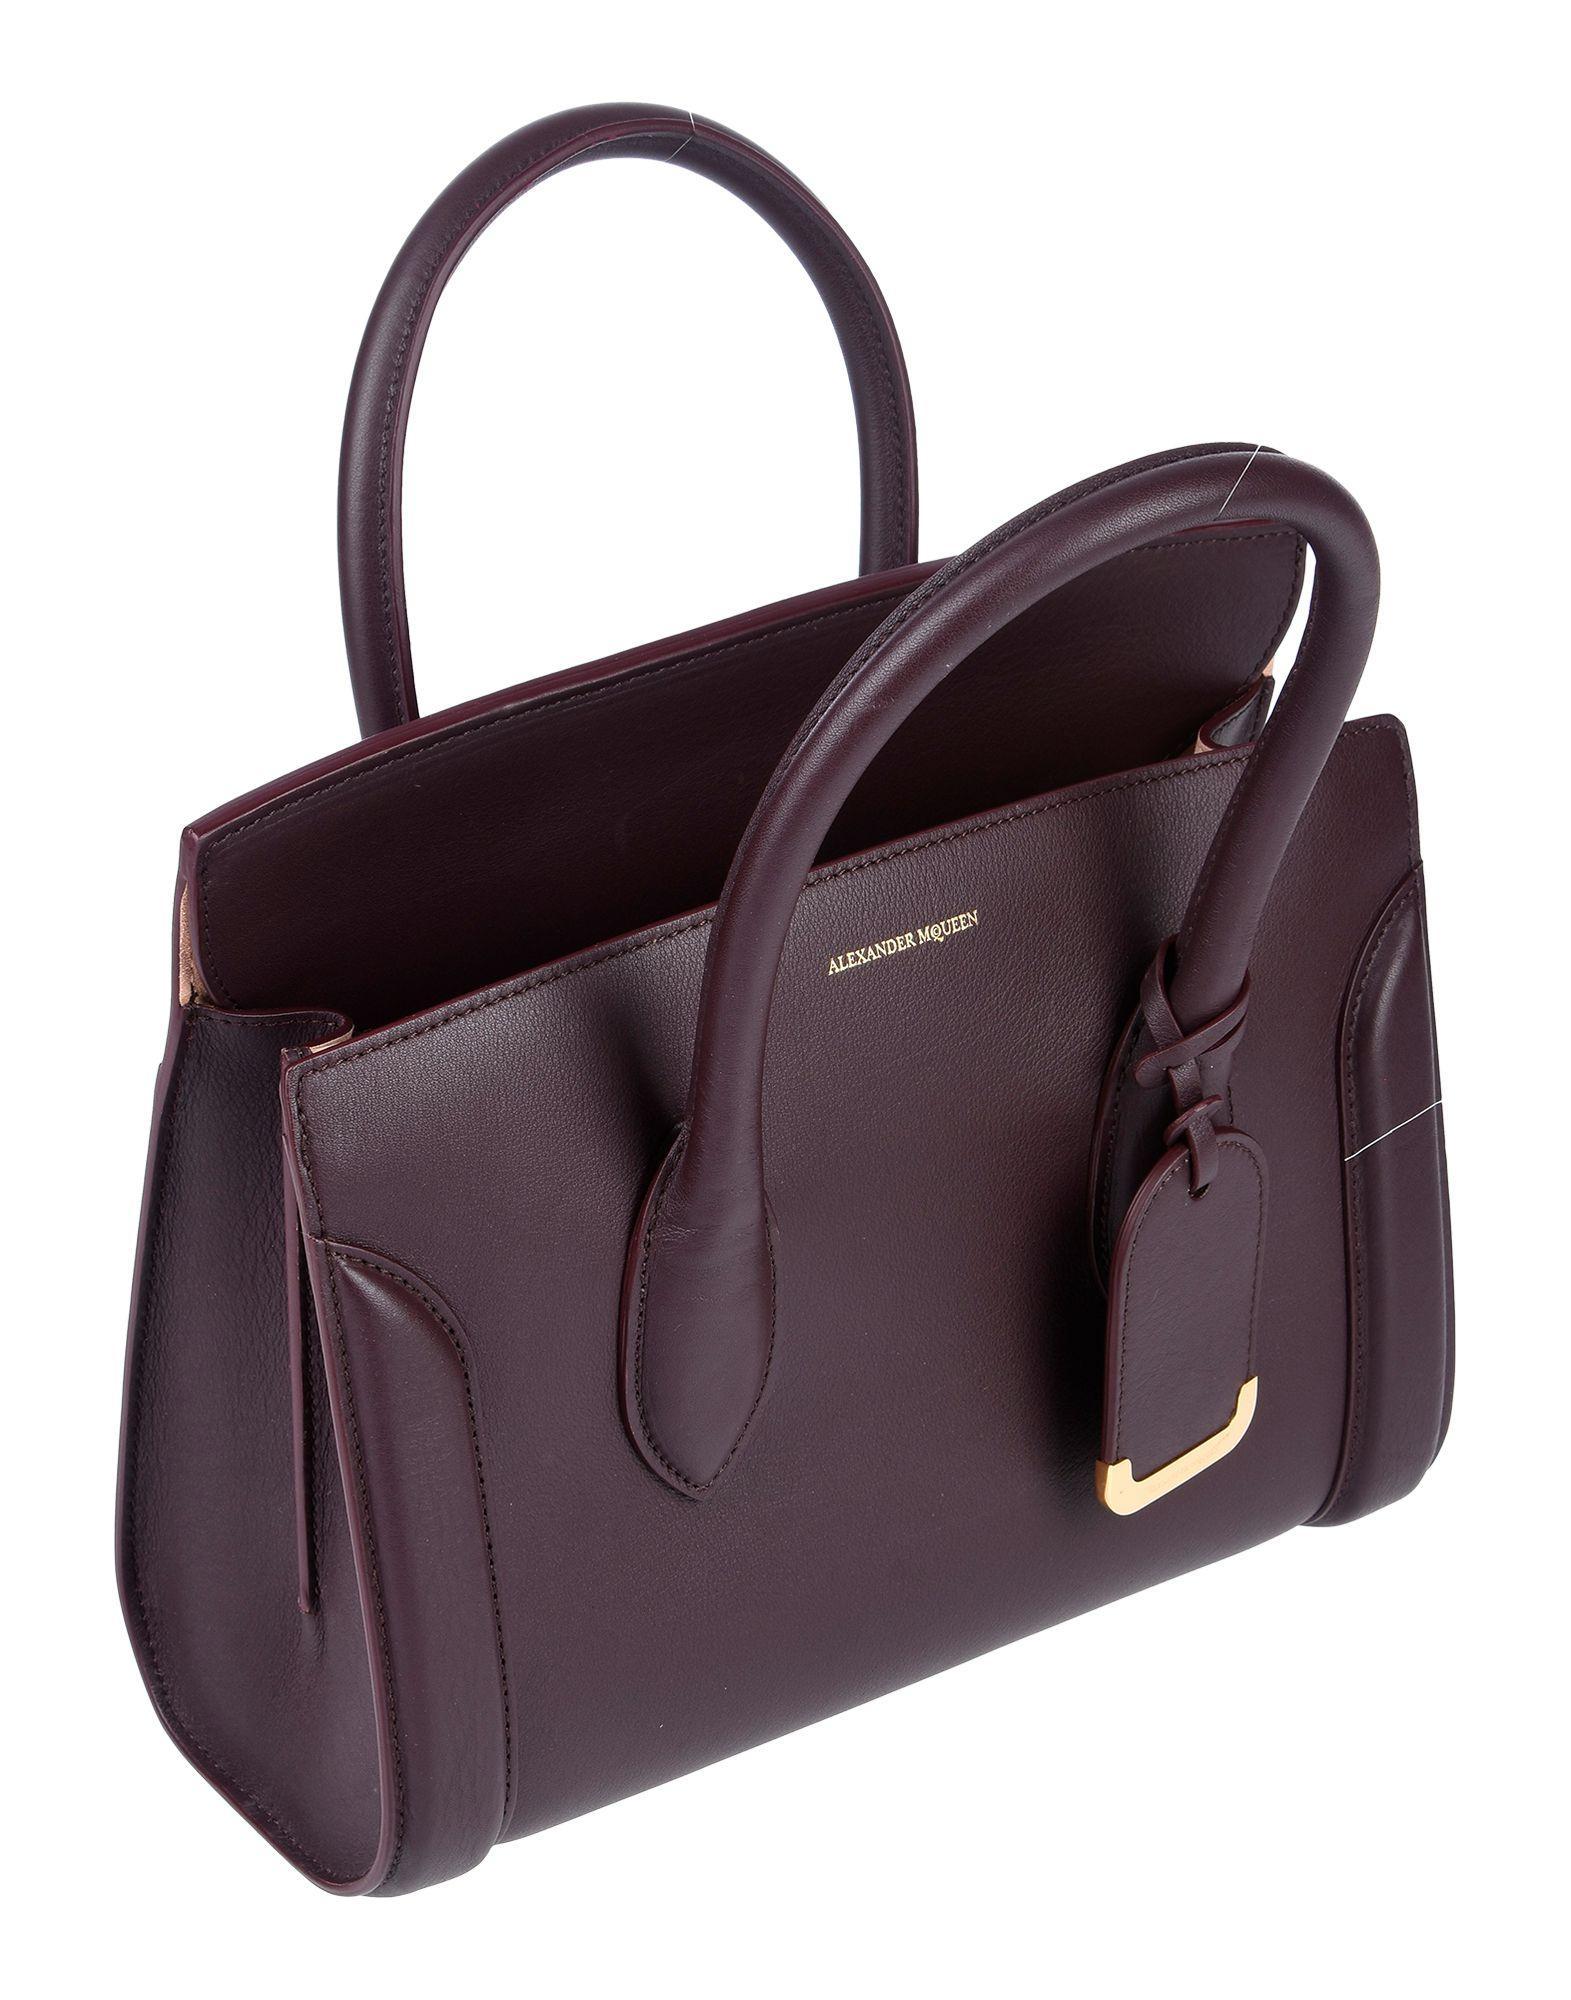 Alexander McQueen Leder Handtaschen in Lila O0RV1